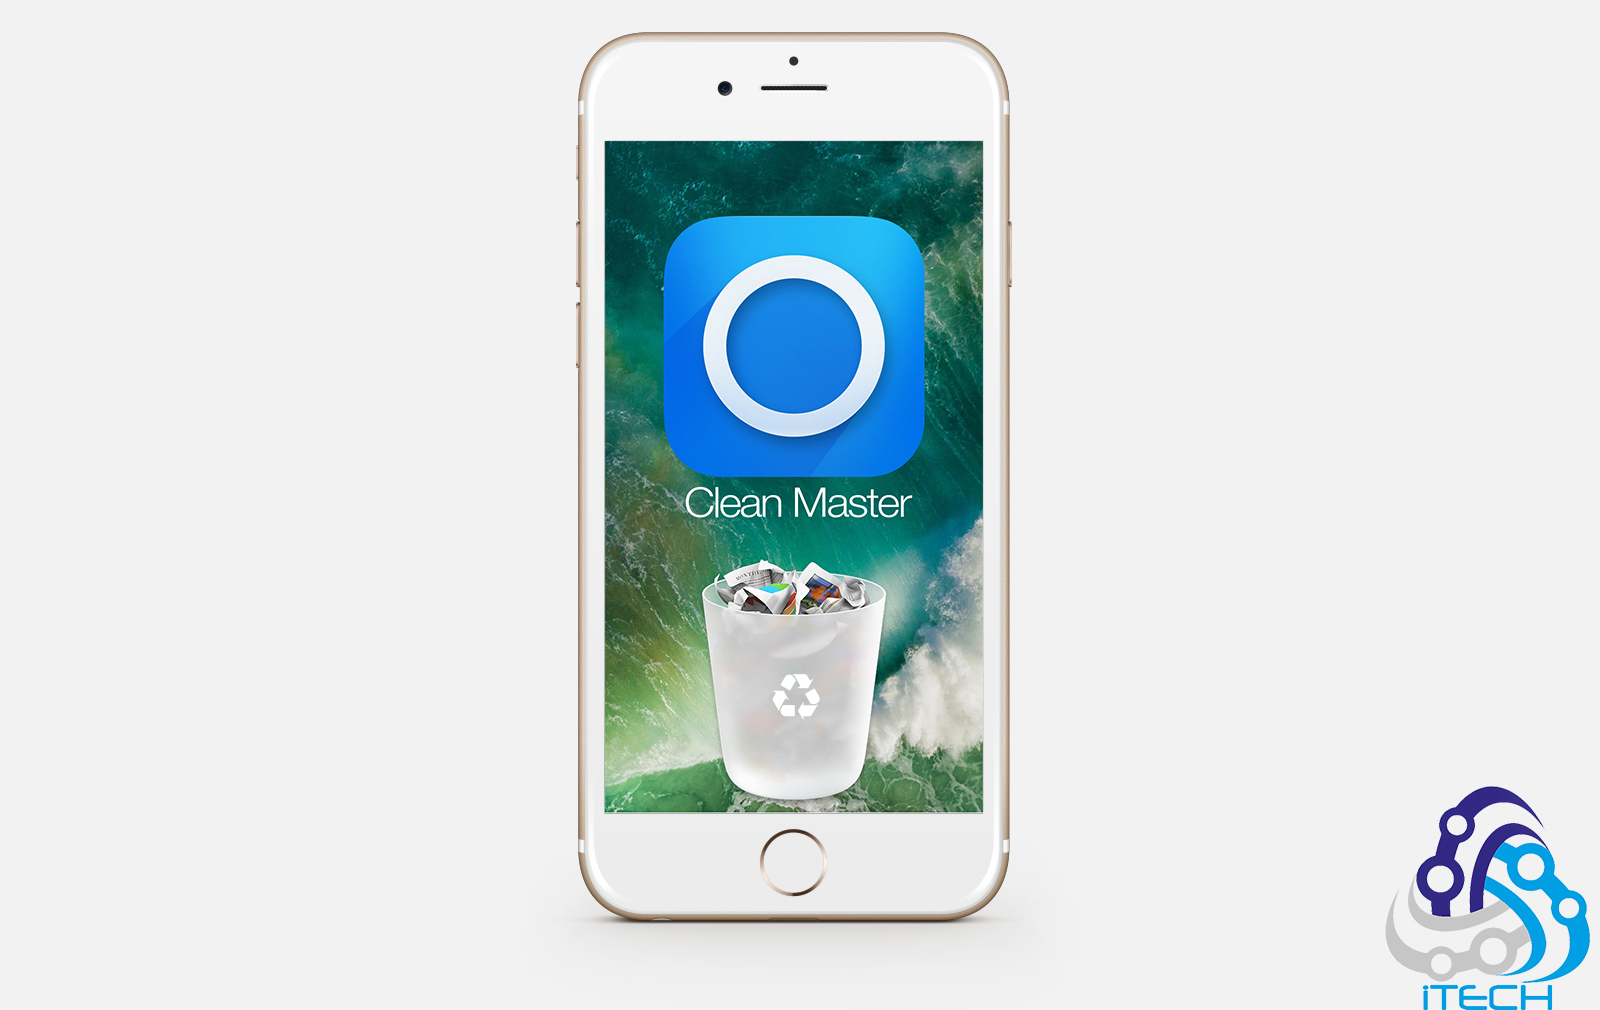 تحميل كلين ماستر ماستر نظيفة CM Security للايفون والايباد بدون جلبريك